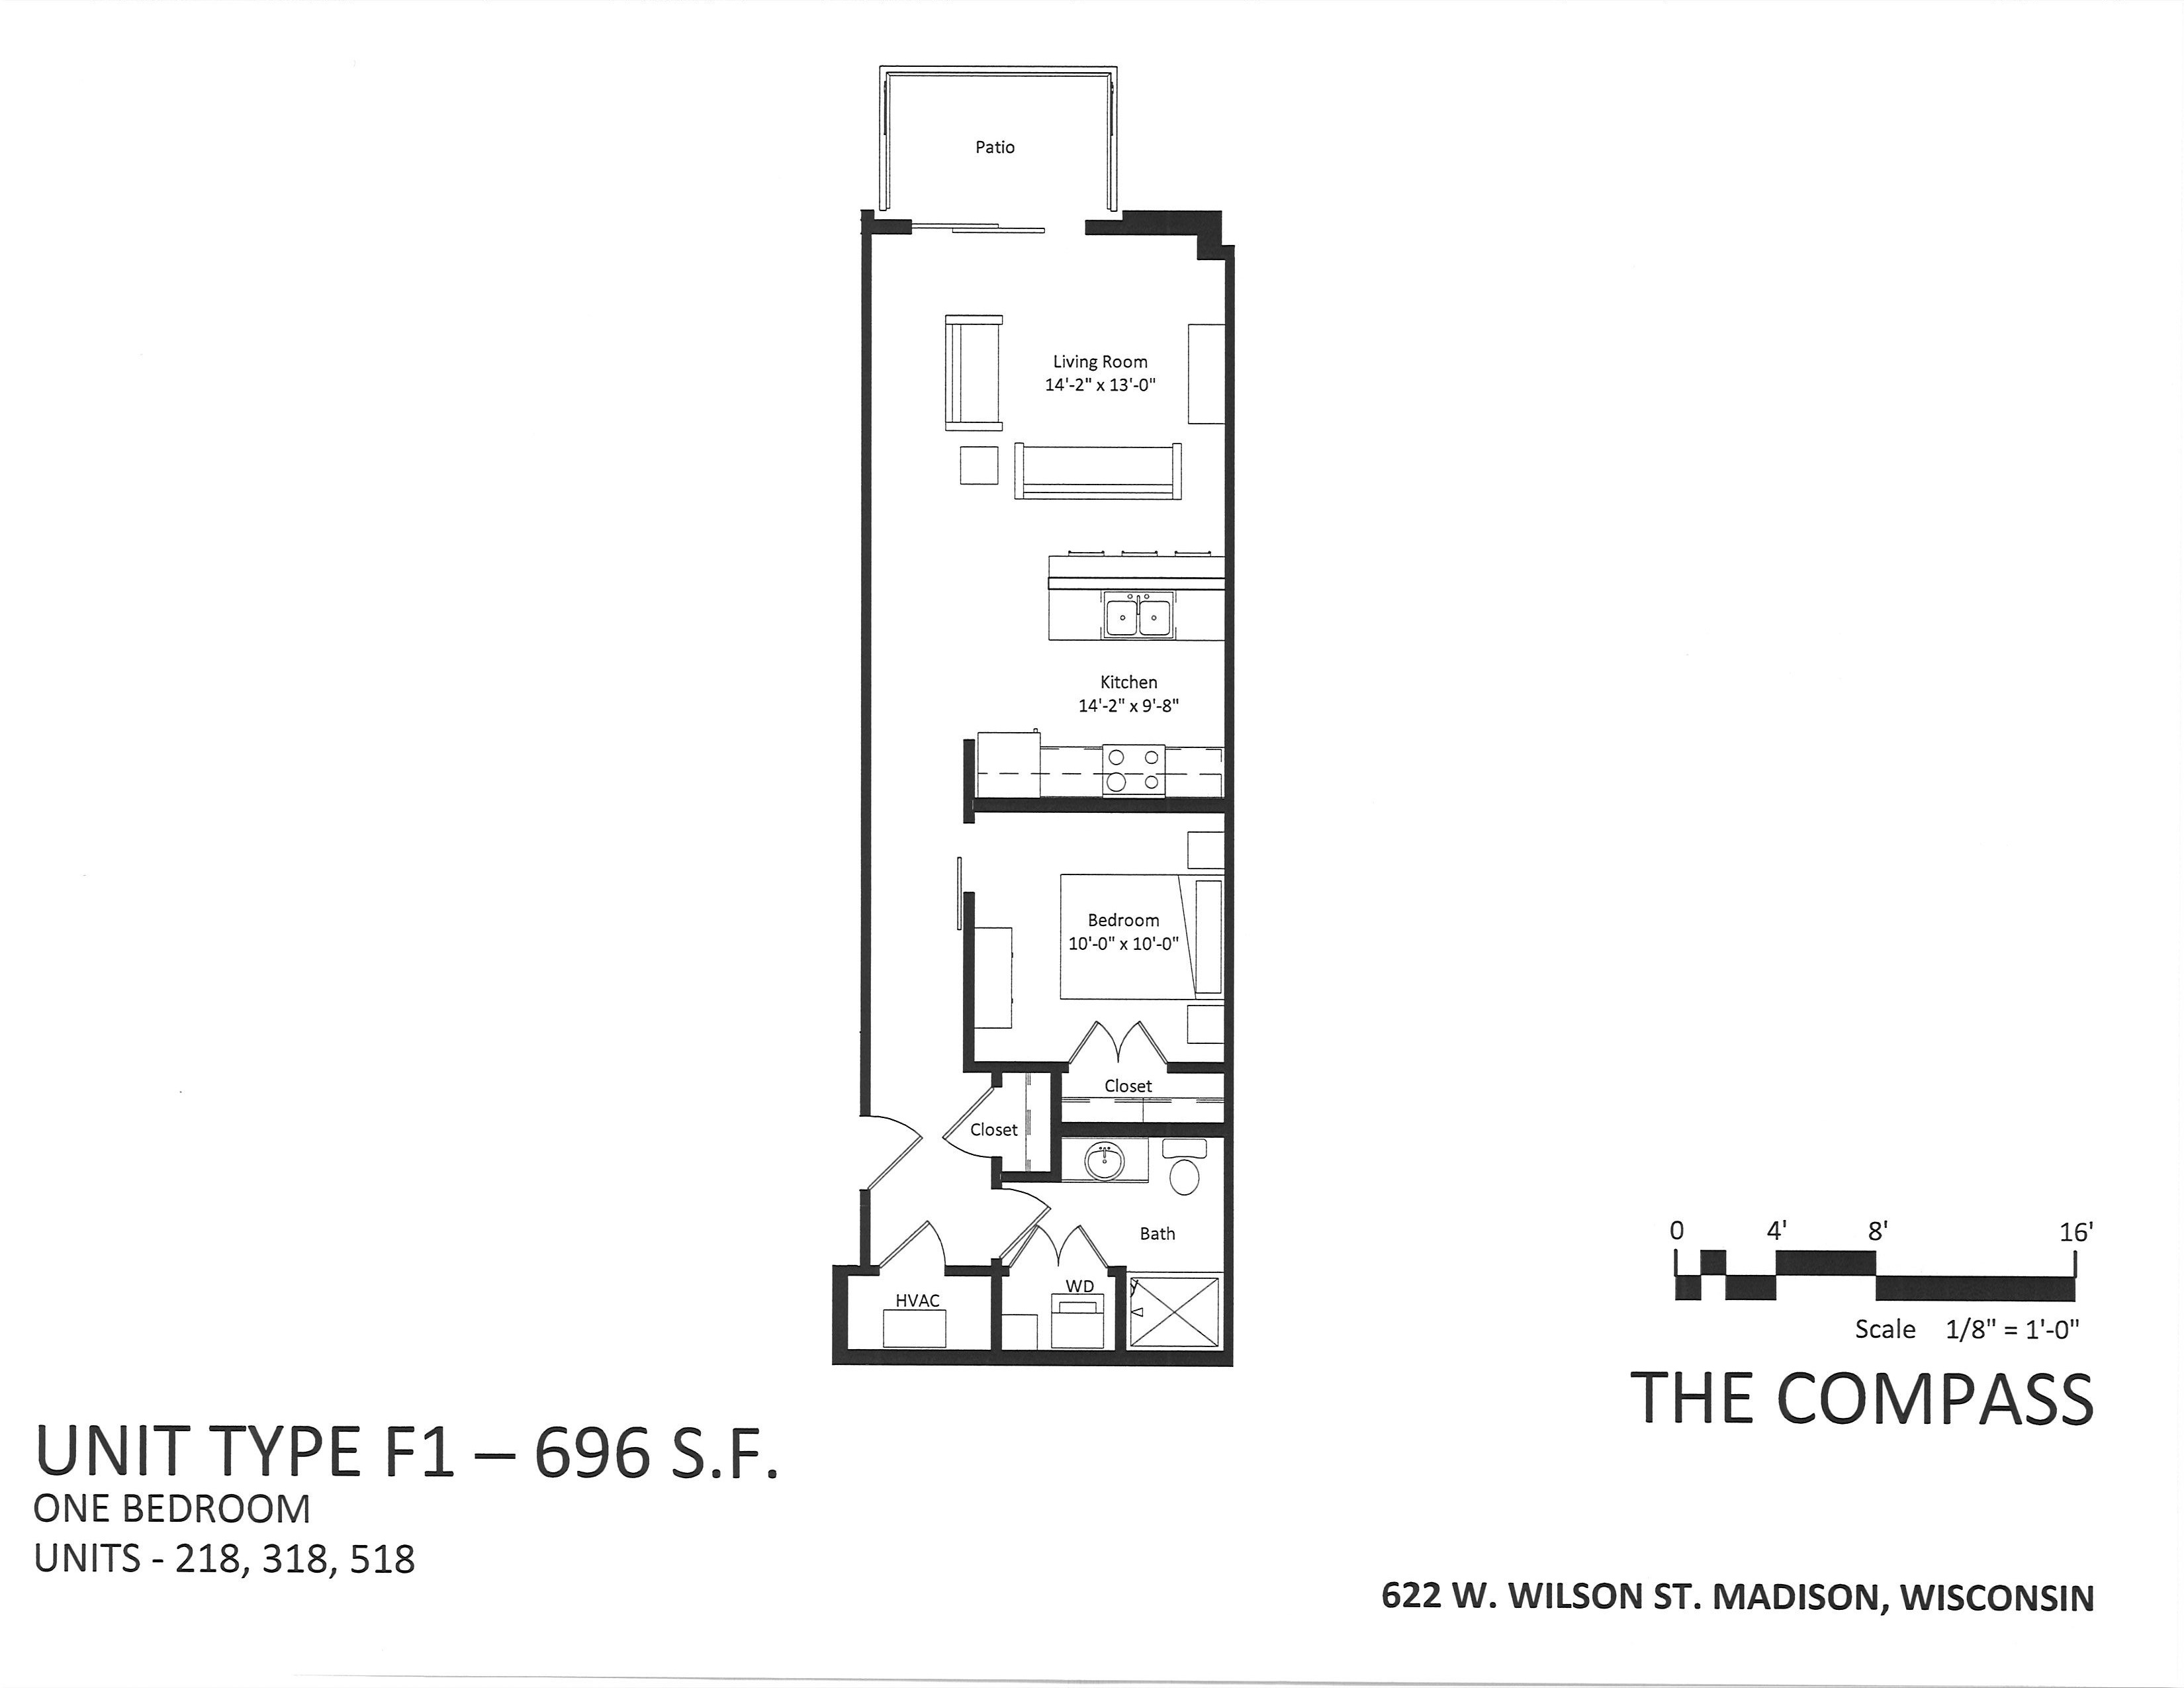 622 W. Wilson St. 518